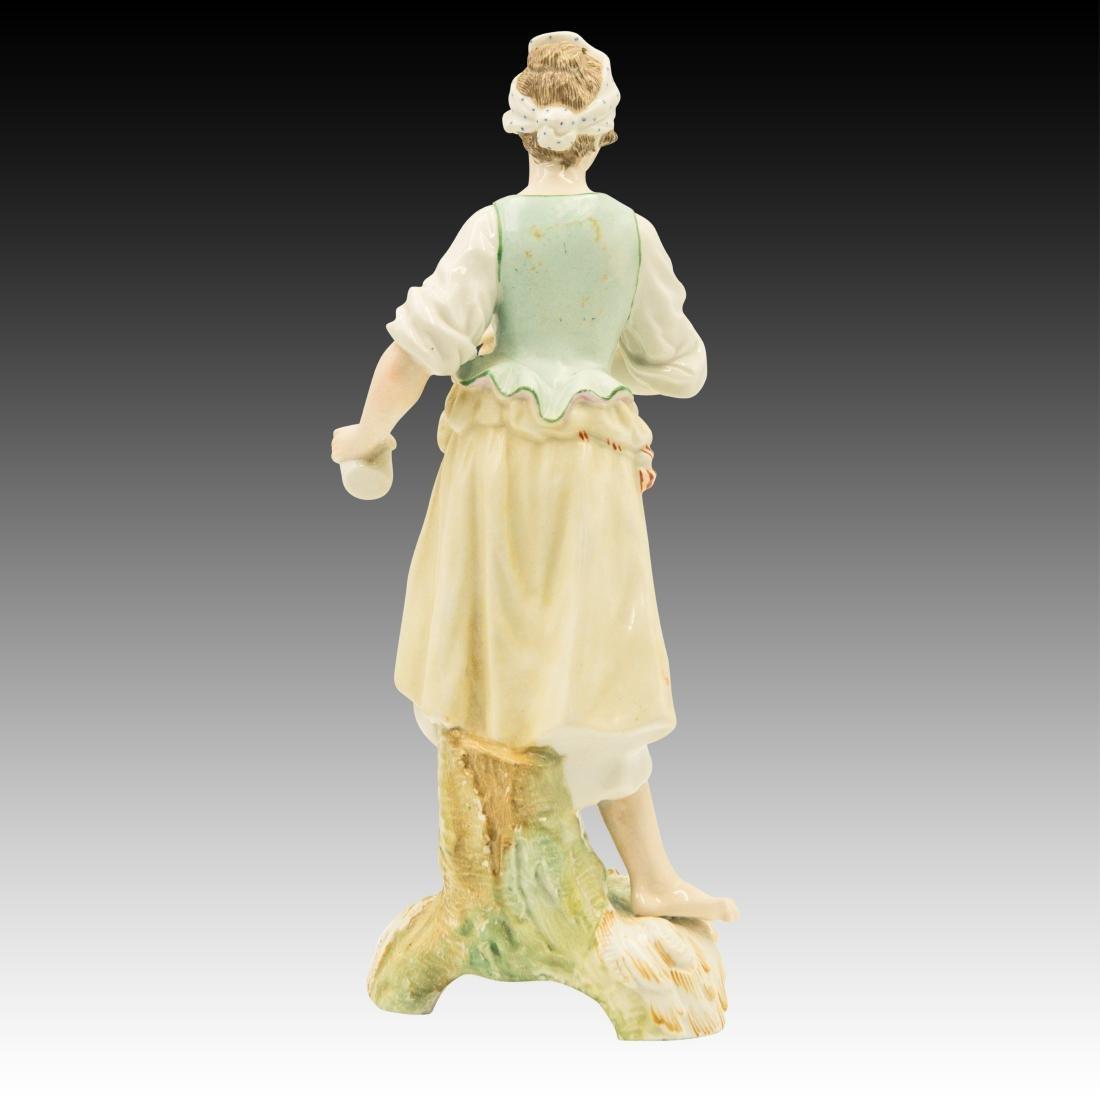 Barefoot Peasant Girl Figurine Spilling Her Drink - 3